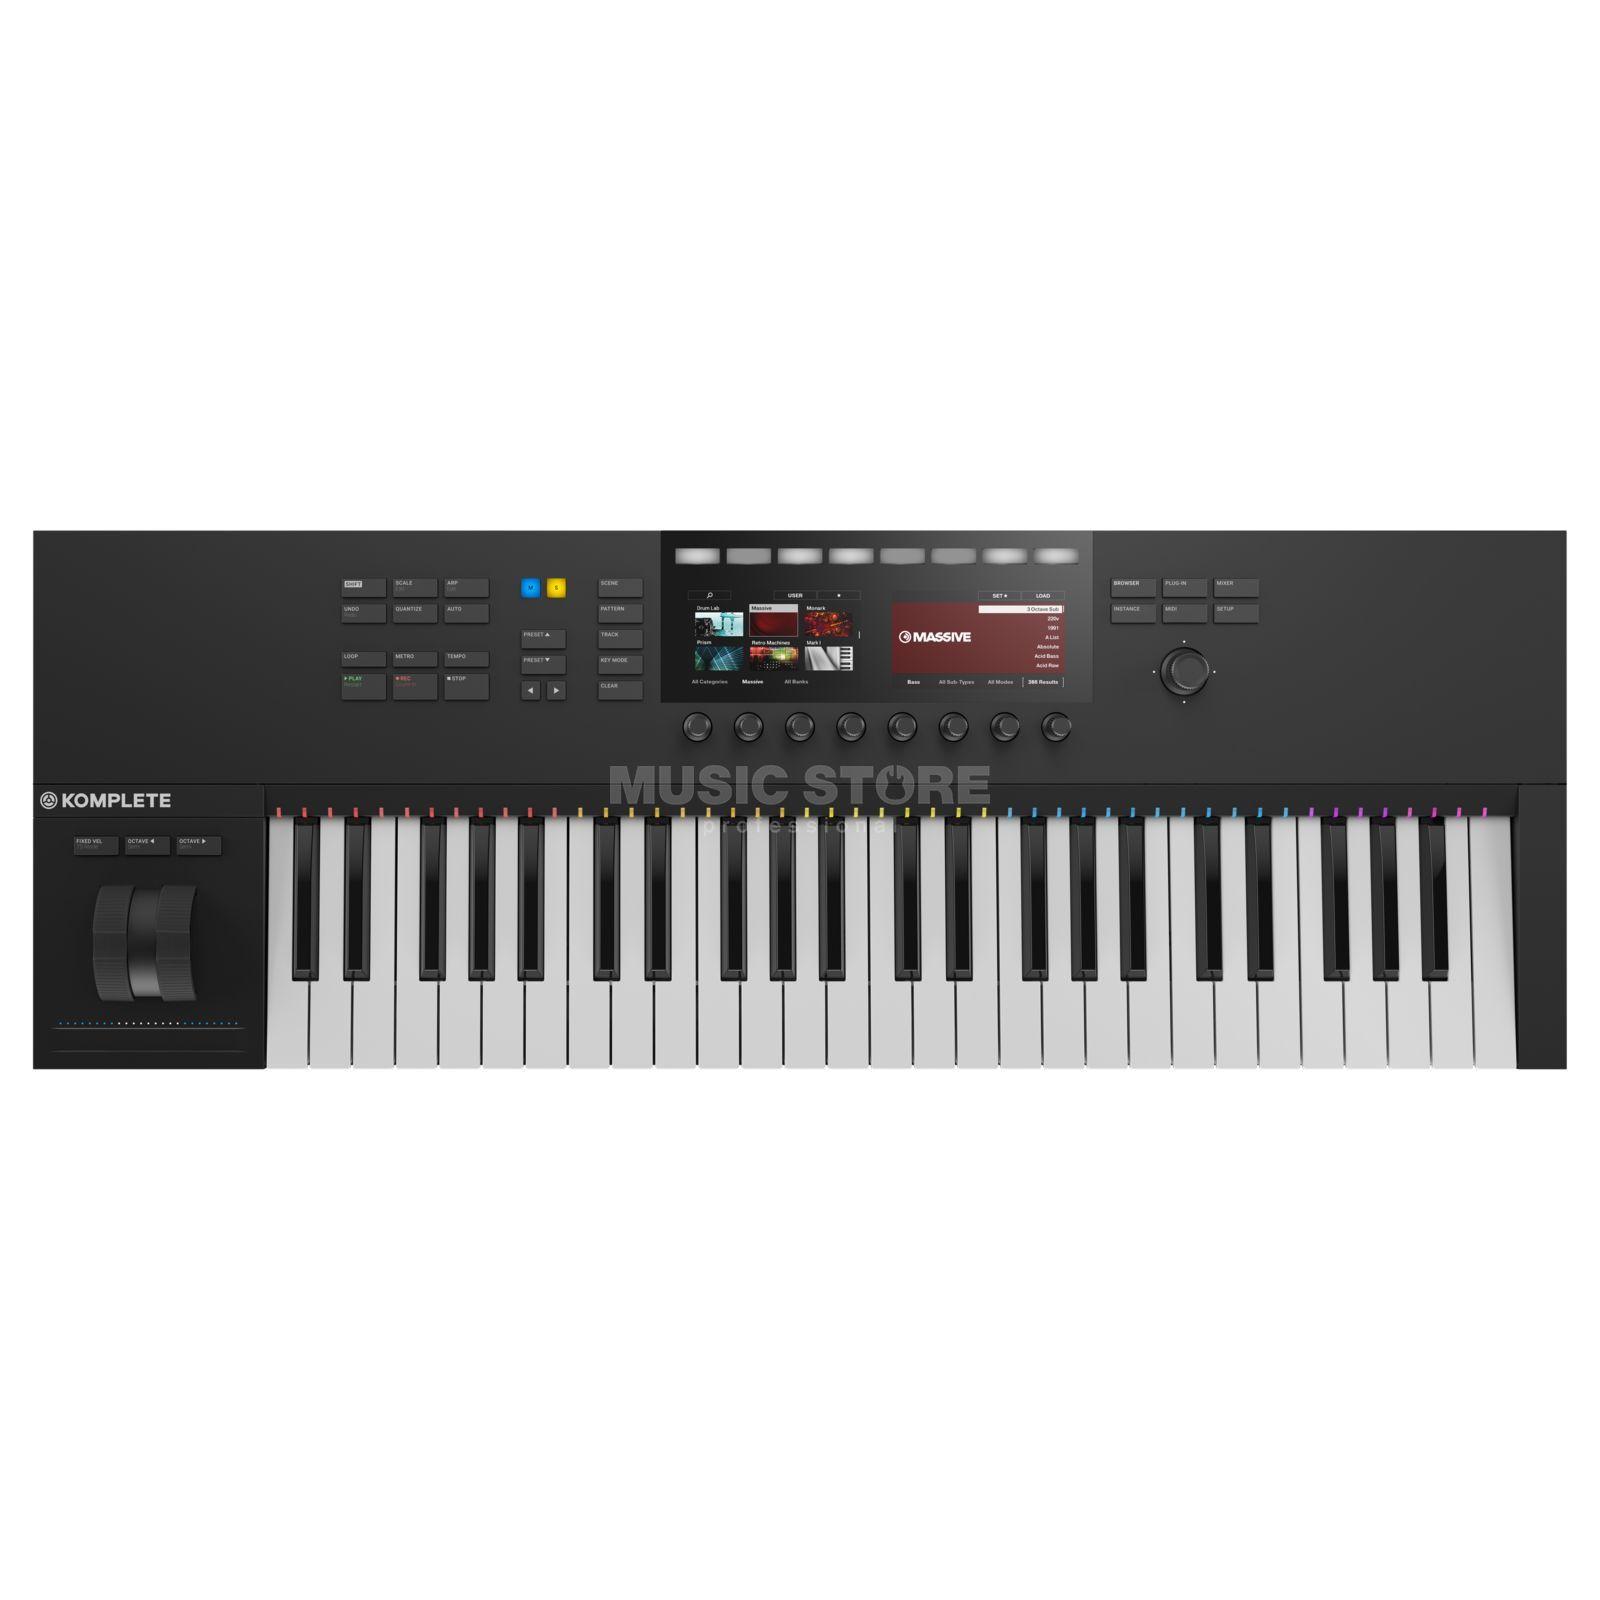 Image Result For Yamaha Keyboard Controller